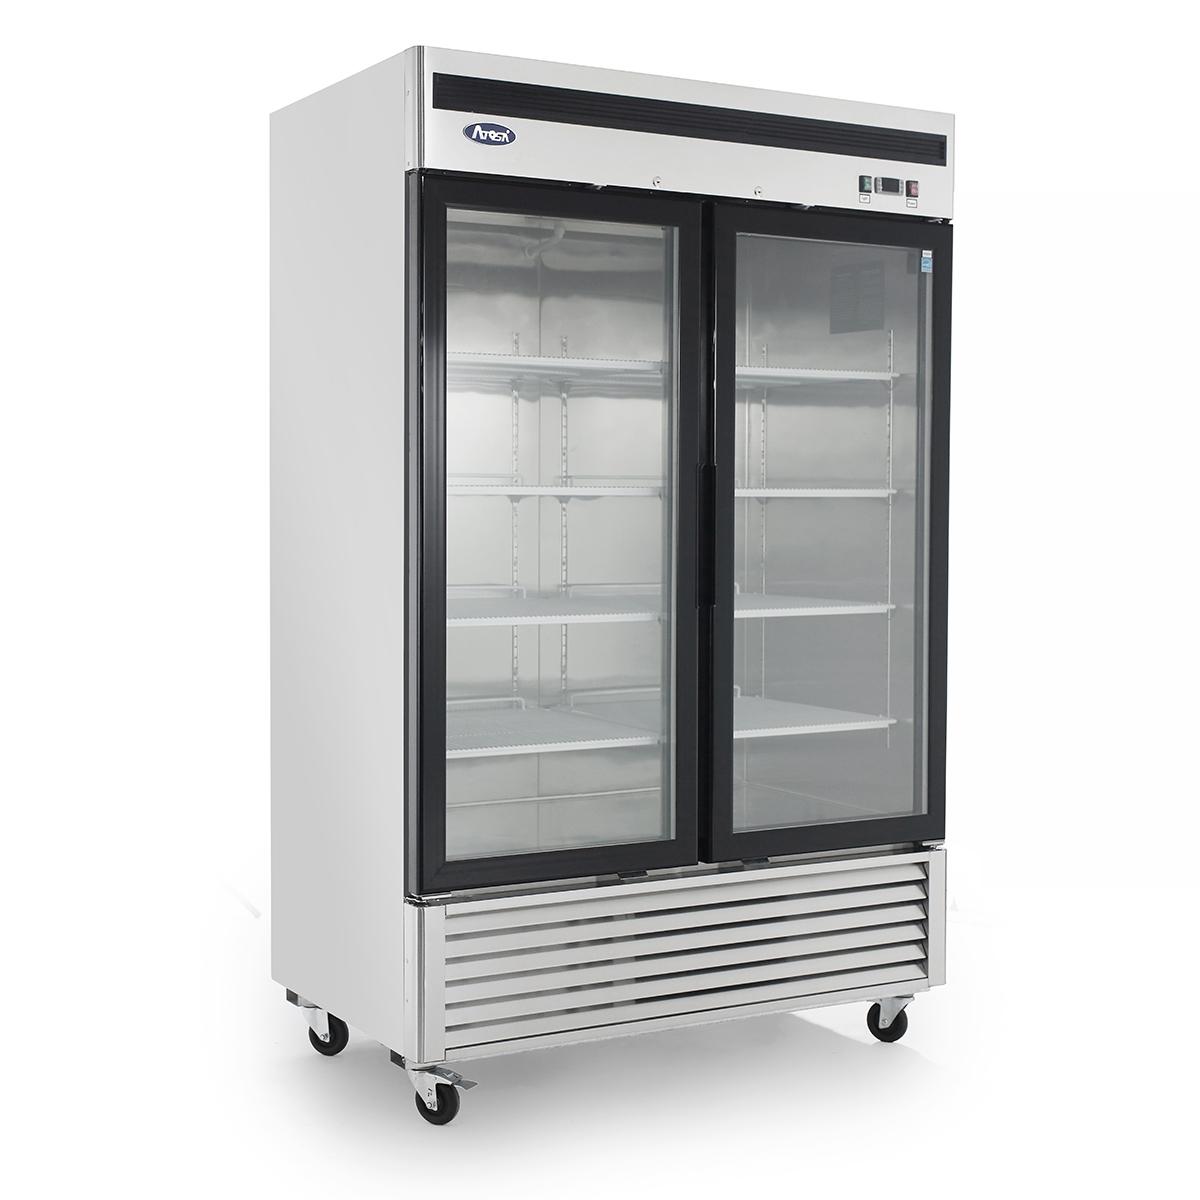 Mcf8703 bottom mount 2 two glass door freezer atosa catering mcf8703 bottom mount 2 two glass door freezer planetlyrics Choice Image